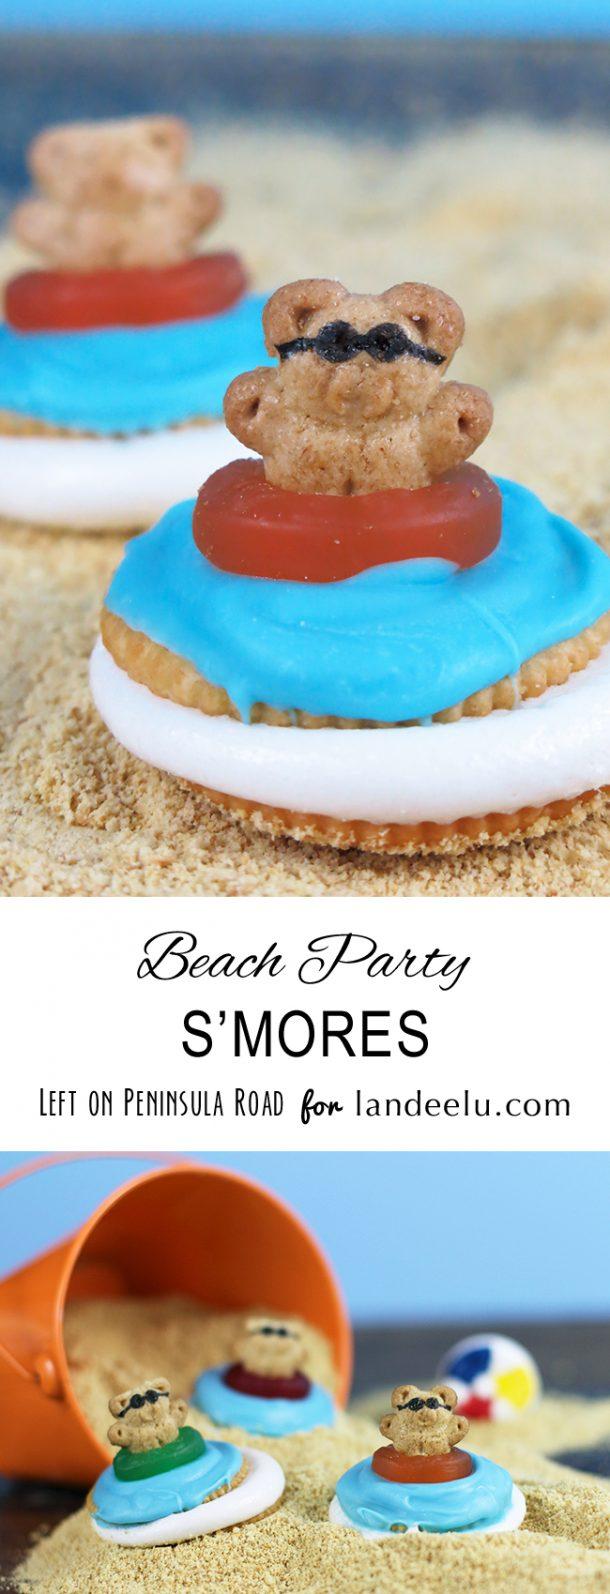 S'Mores Dessert Treats Recipes - Microwave Beach Party S'mores with cute Teddy Grahams Recipe via Landeelu